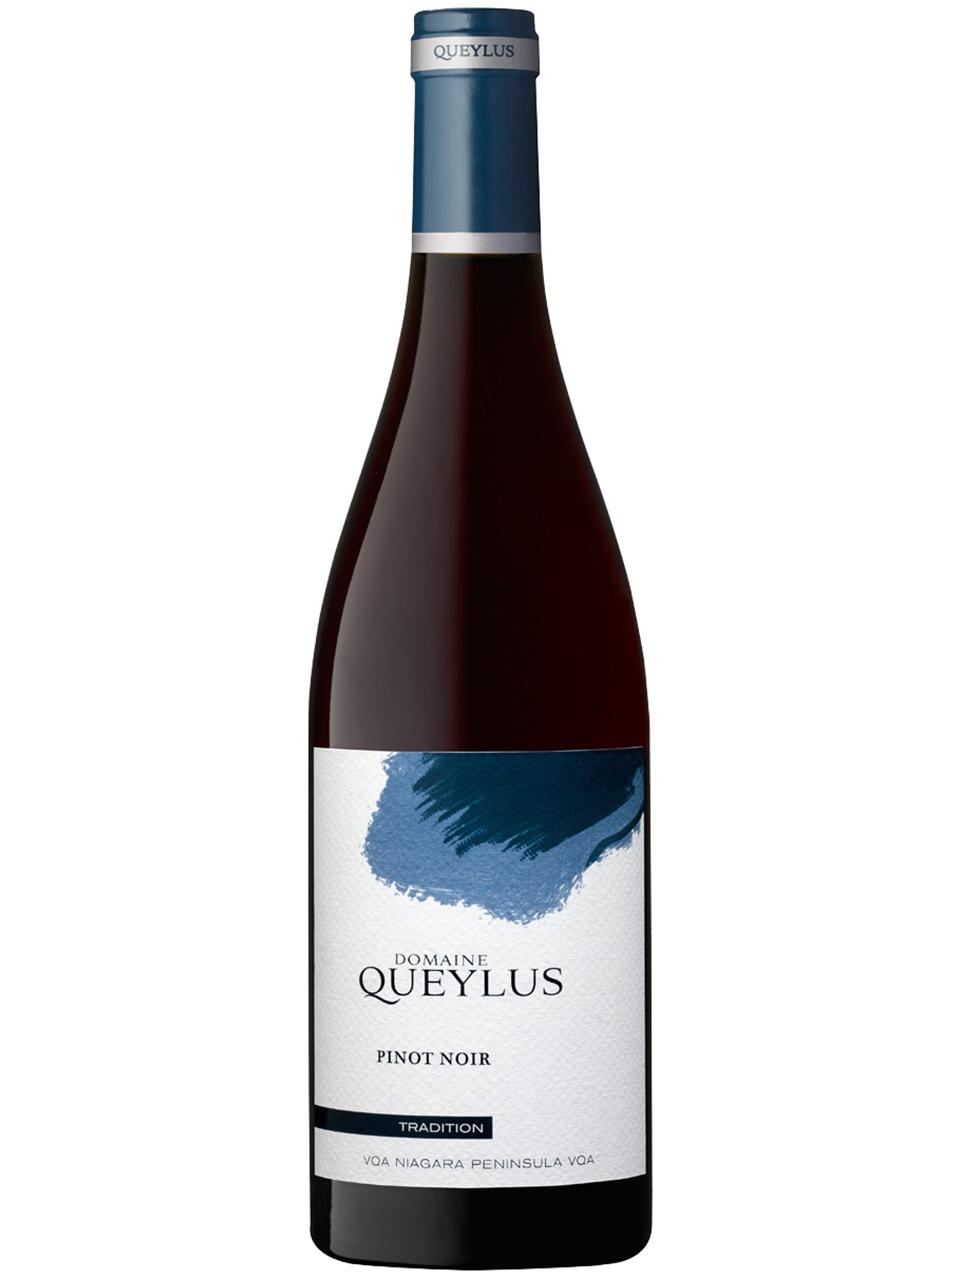 Queylus Pinot Noir Tradition 2013